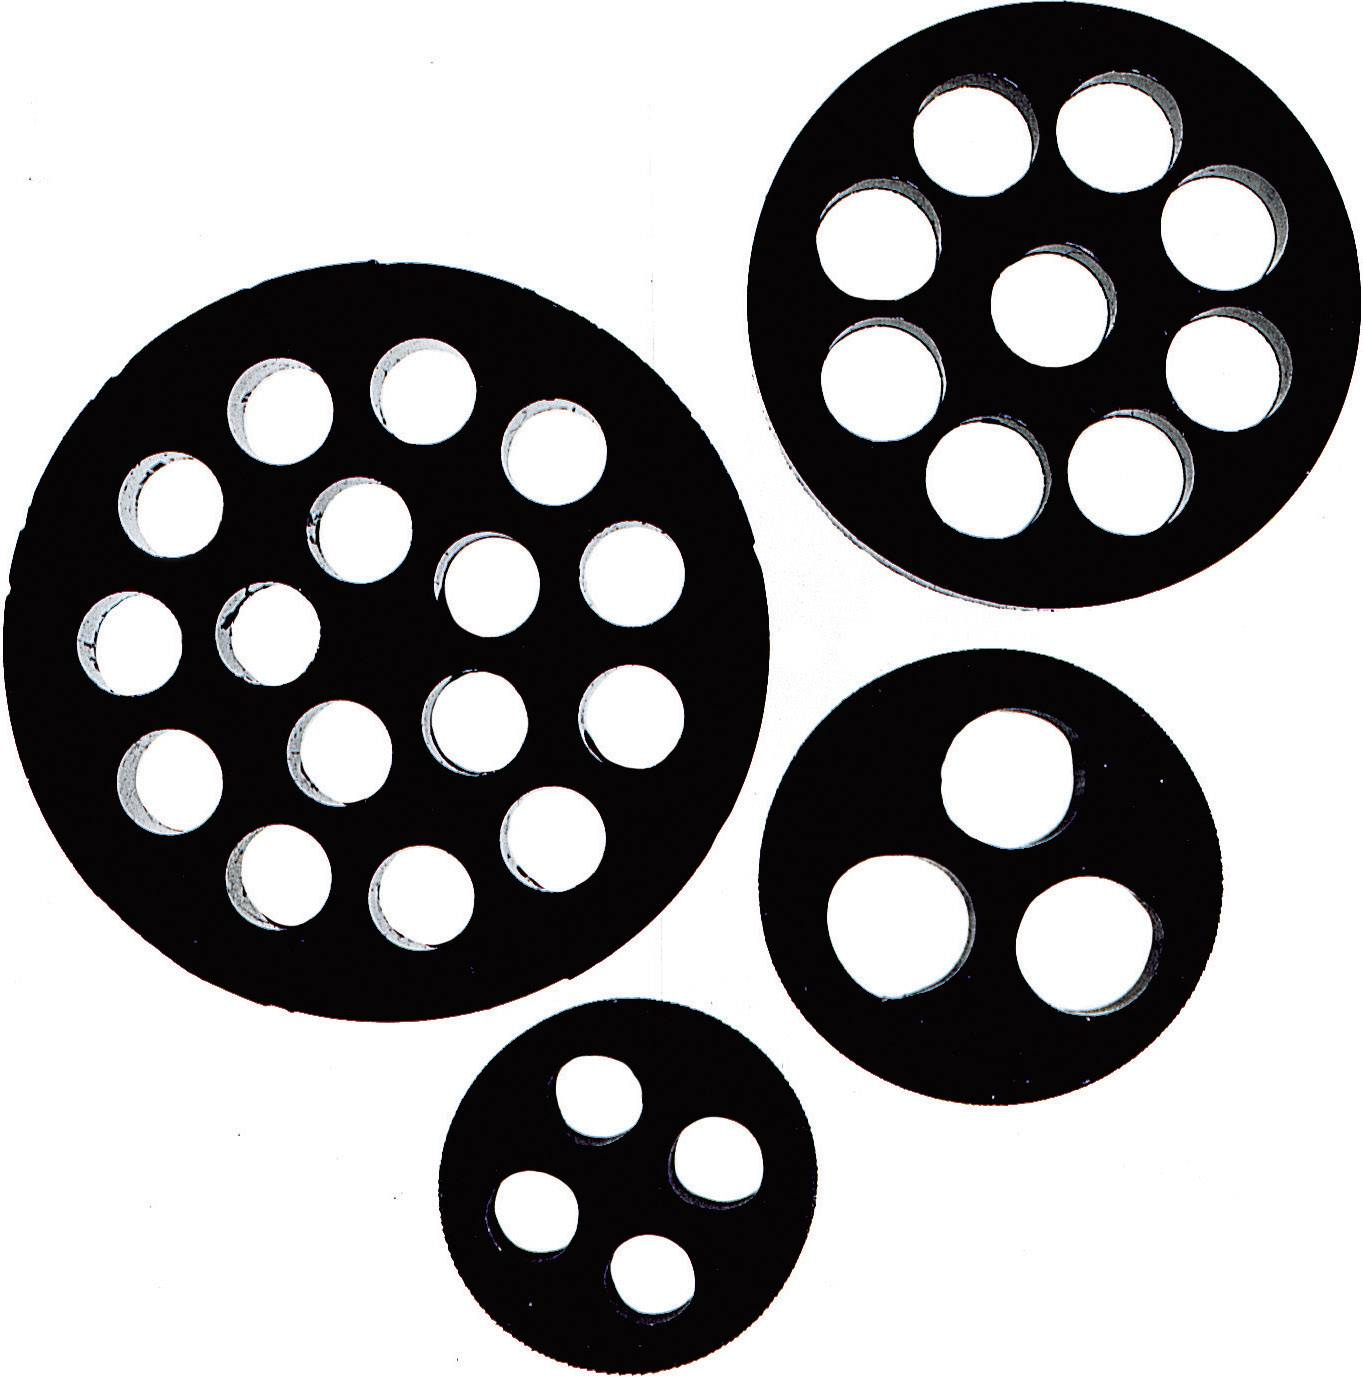 Tesniaca vložka s viacerými priechodmi LappKabel SKINTOP® DIX-M25, M25, nitril kaučuk, 1 ks